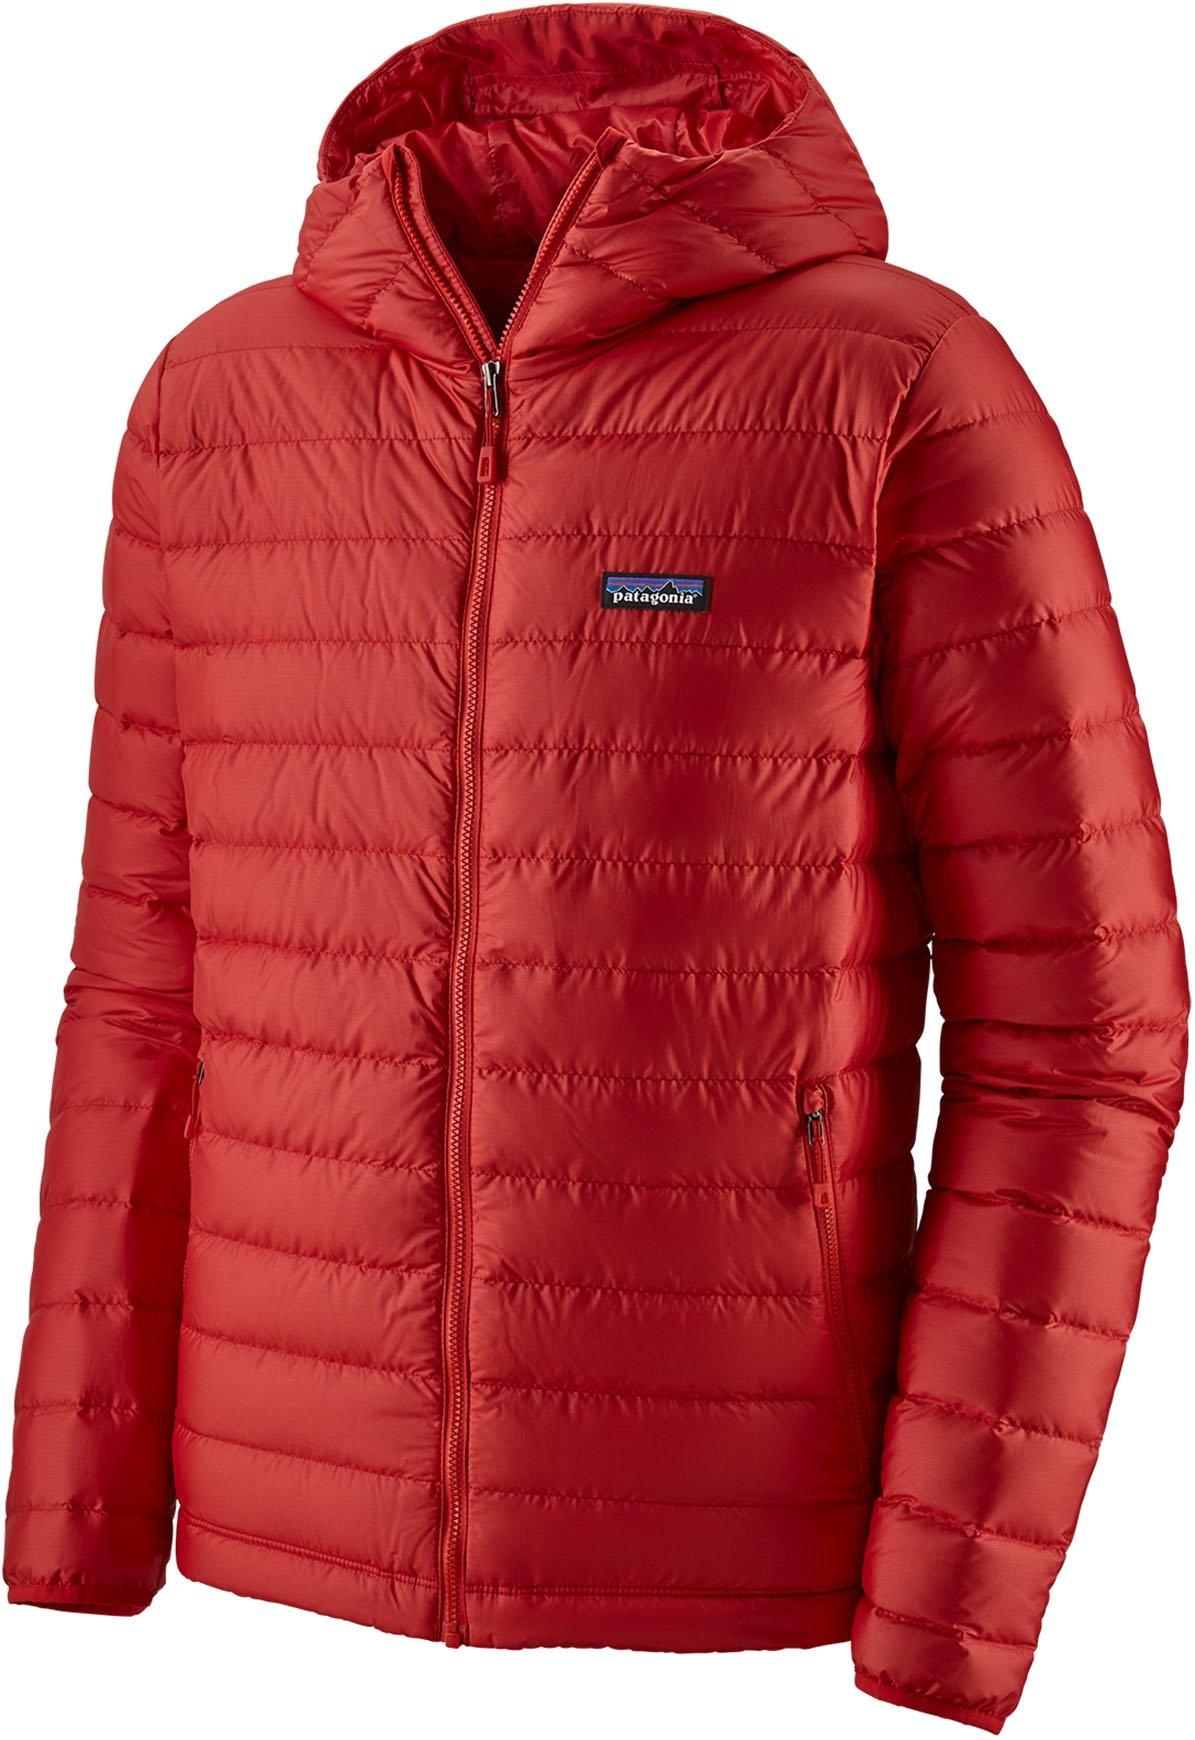 (Snowleader) Patagonia Down Sweater Hoody Fire Daunenjacke